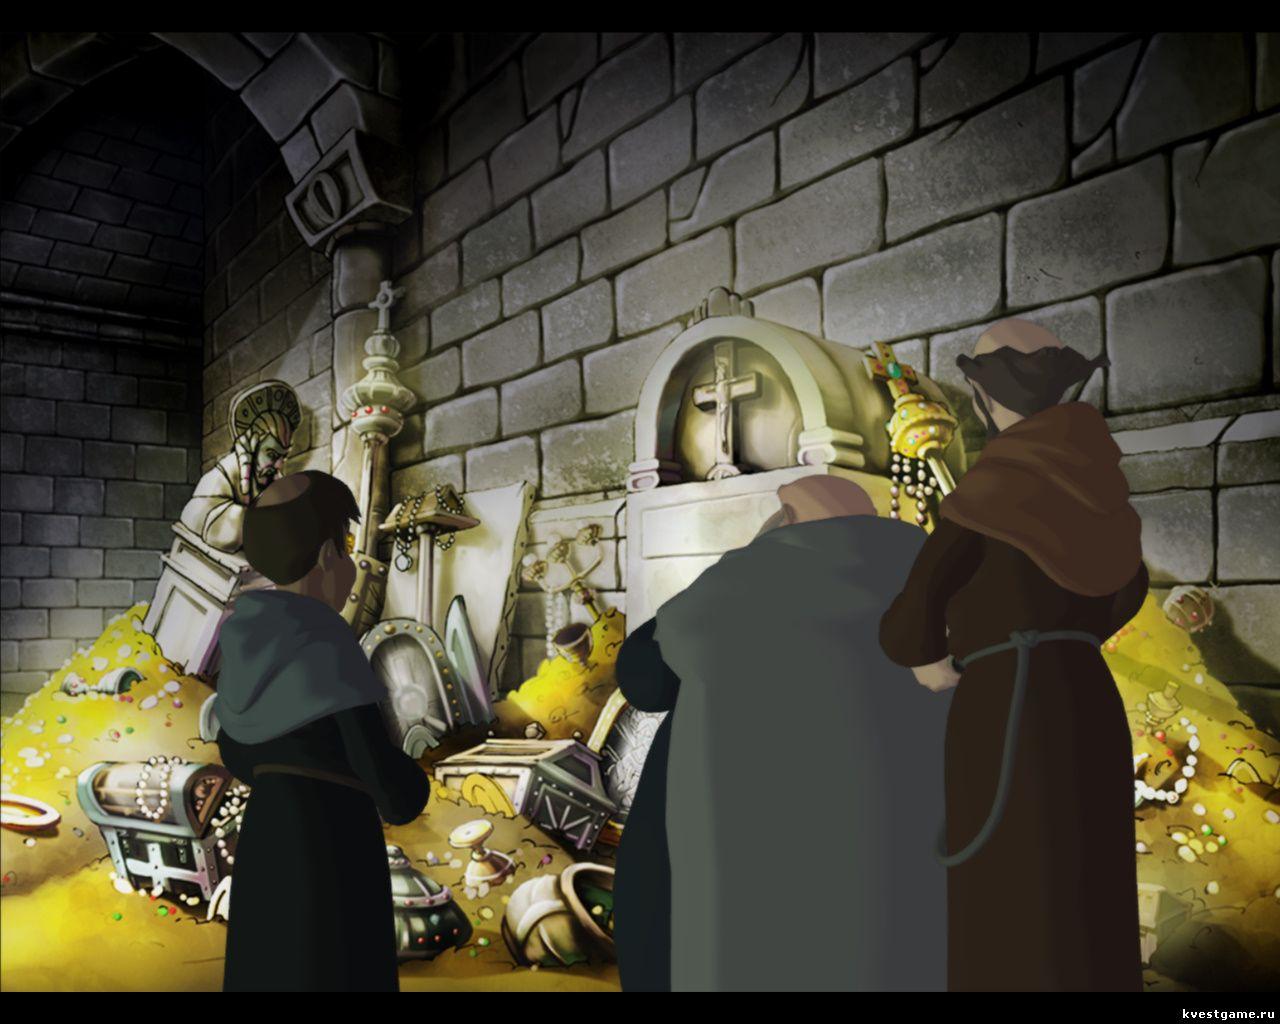 Murder in the Abbey - Леонардо делает слепок ключа от крипты (глава 2)